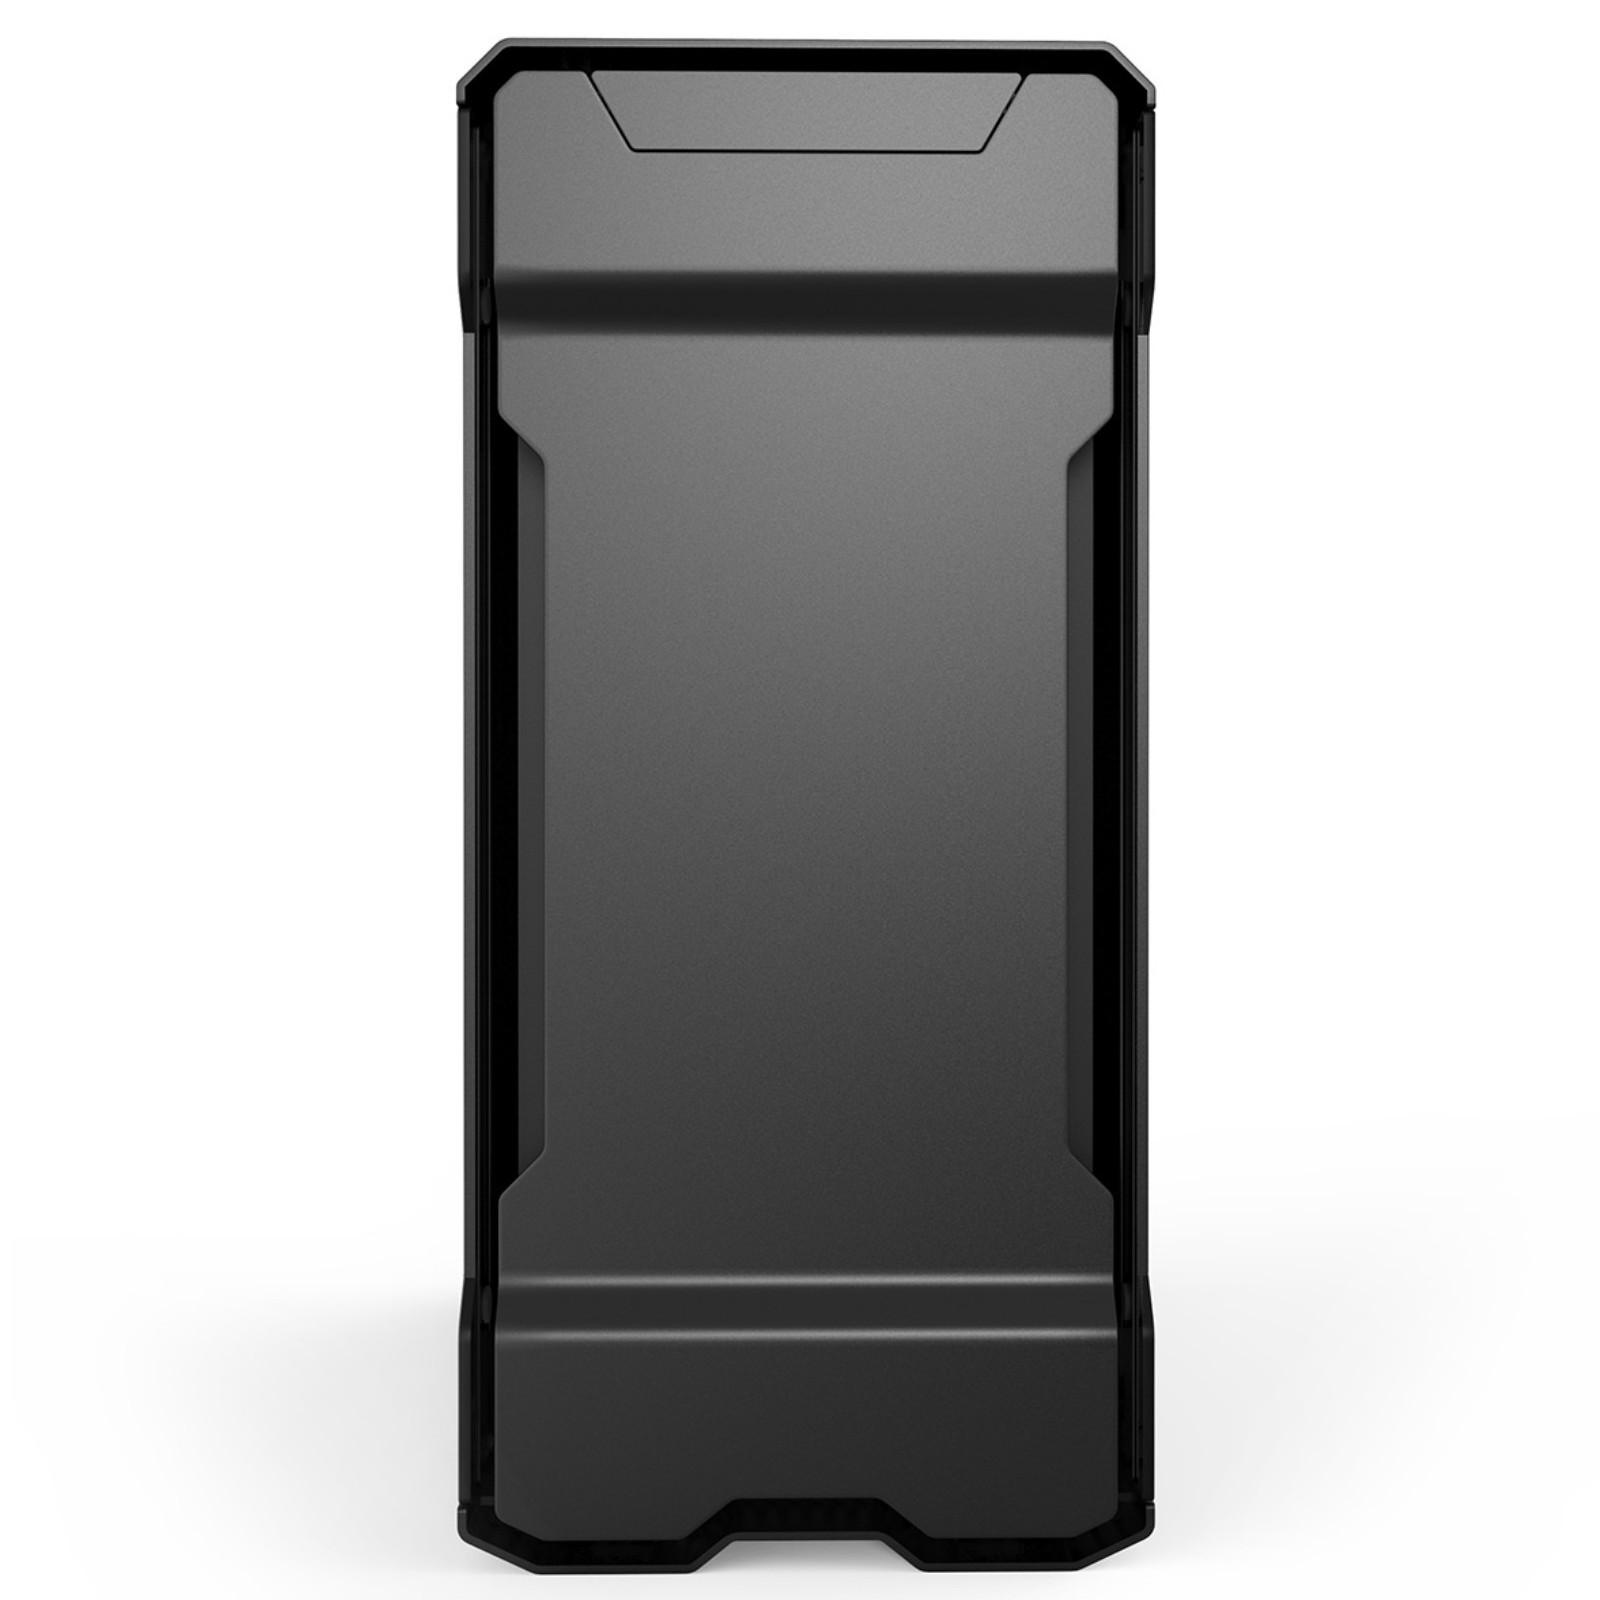 Buy the GGPC Titan RTX 2080 Ti Gaming PC Intel 9th Gen Core